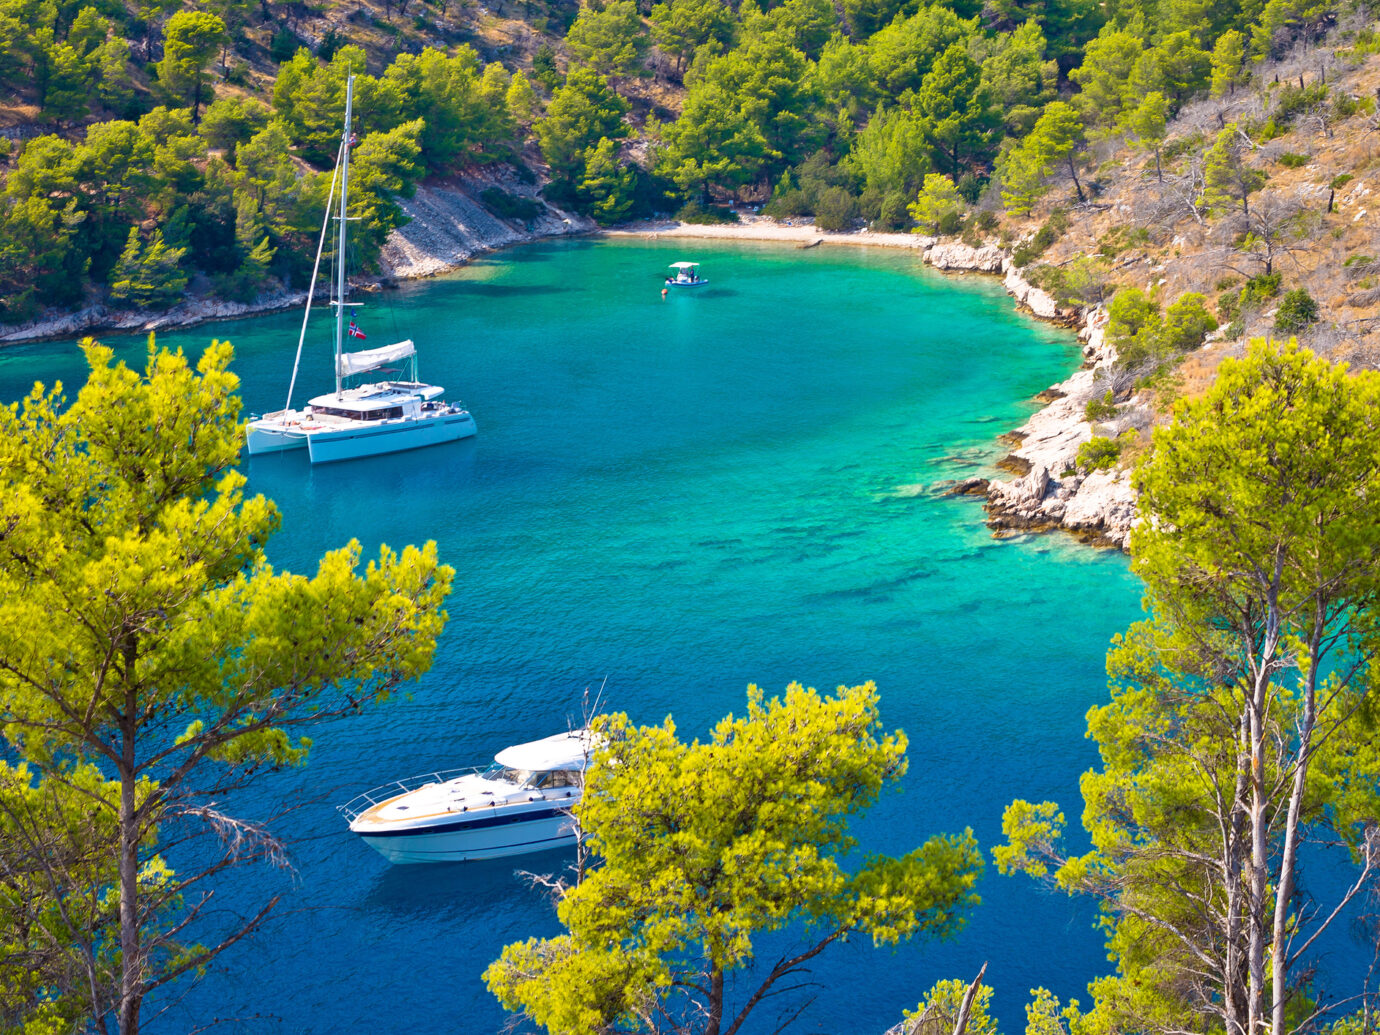 Secret turquoise beach yachting and sailing, Island of Brac, Dalmatia, Croatia